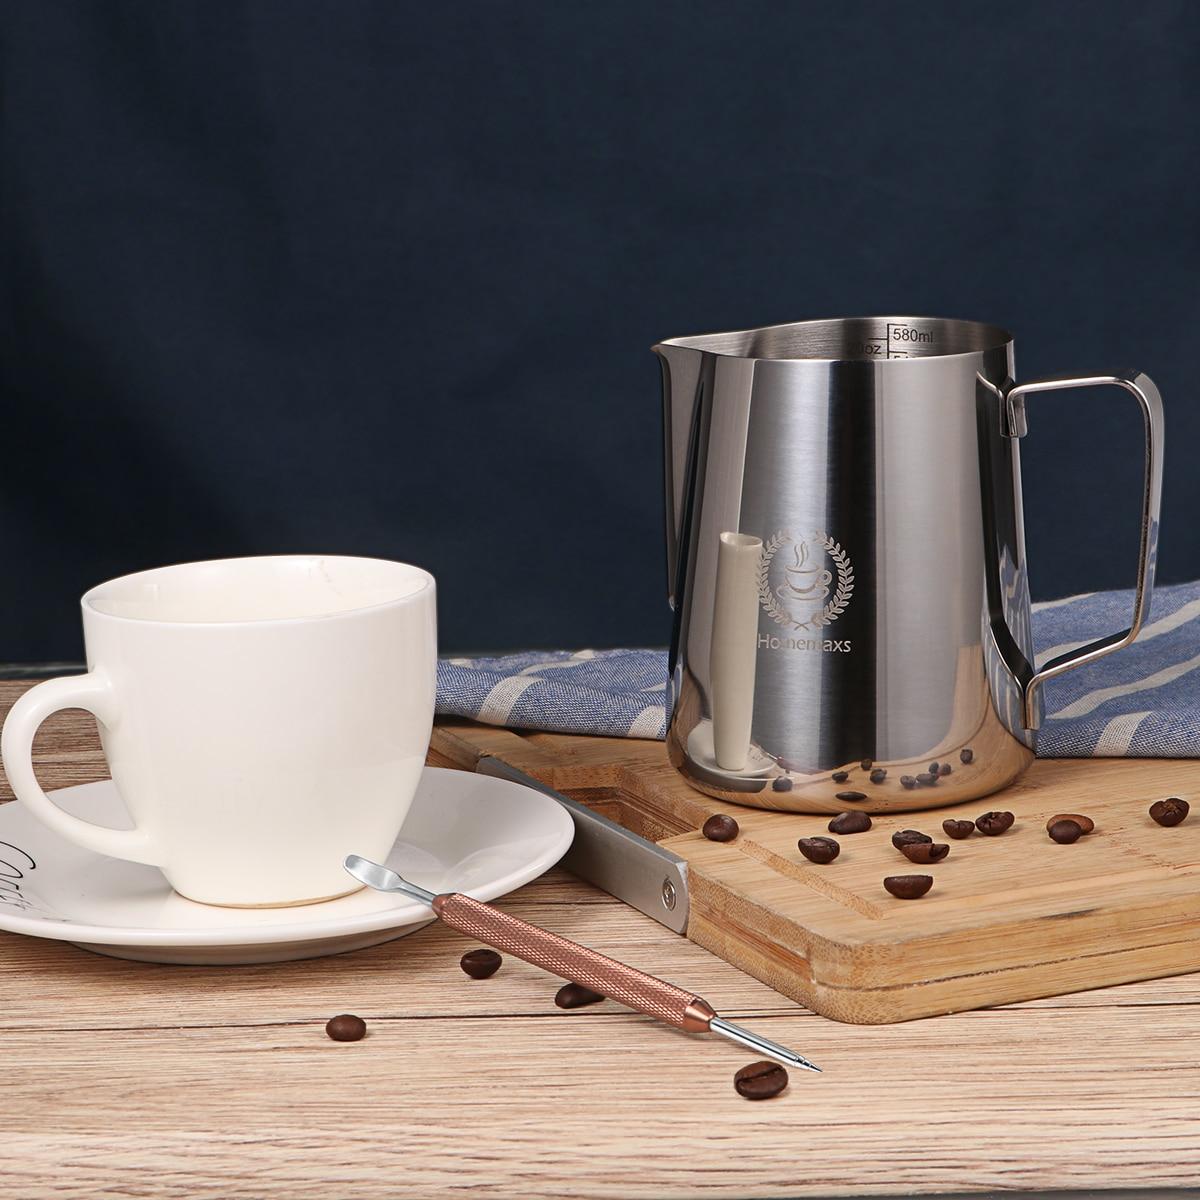 baristas y arte de caf/és blanco 600 ml leche para taza de capuccino Jarra de leche Jarra de leche para m/áquinas de caf/é espresso